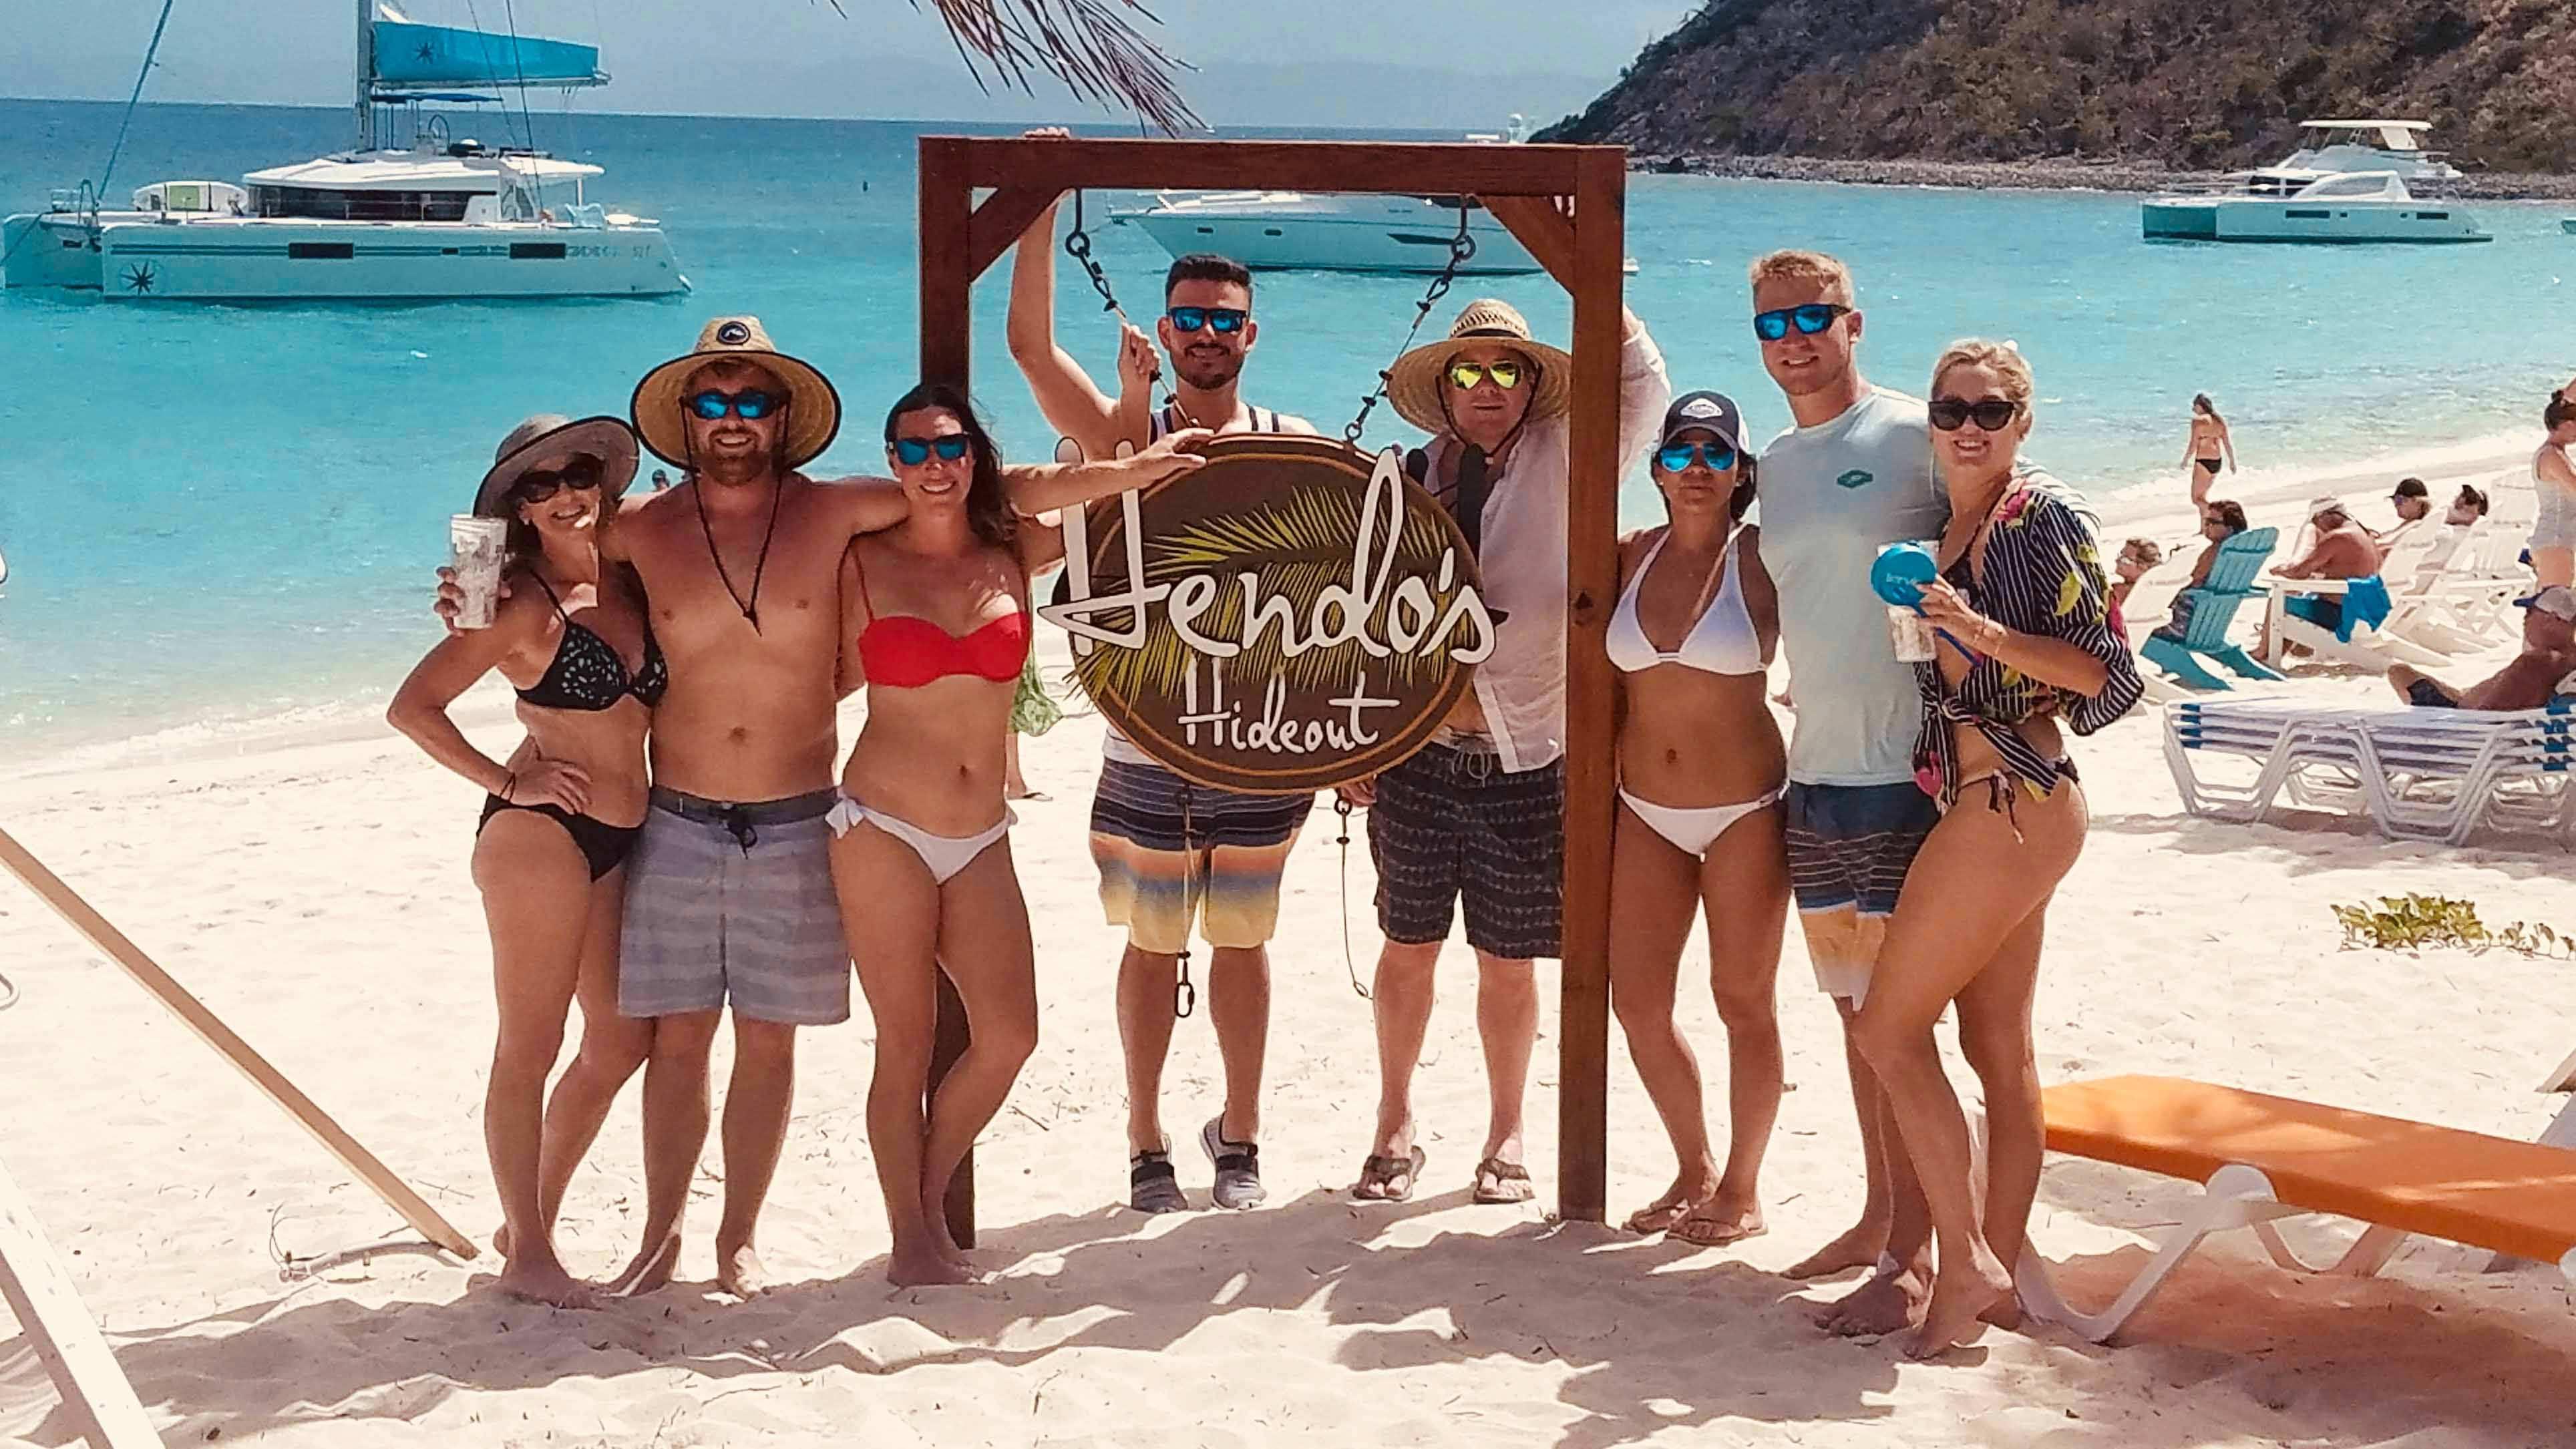 Hendo's Hideout Beach Bar White Bay Marina BVI Caribbean